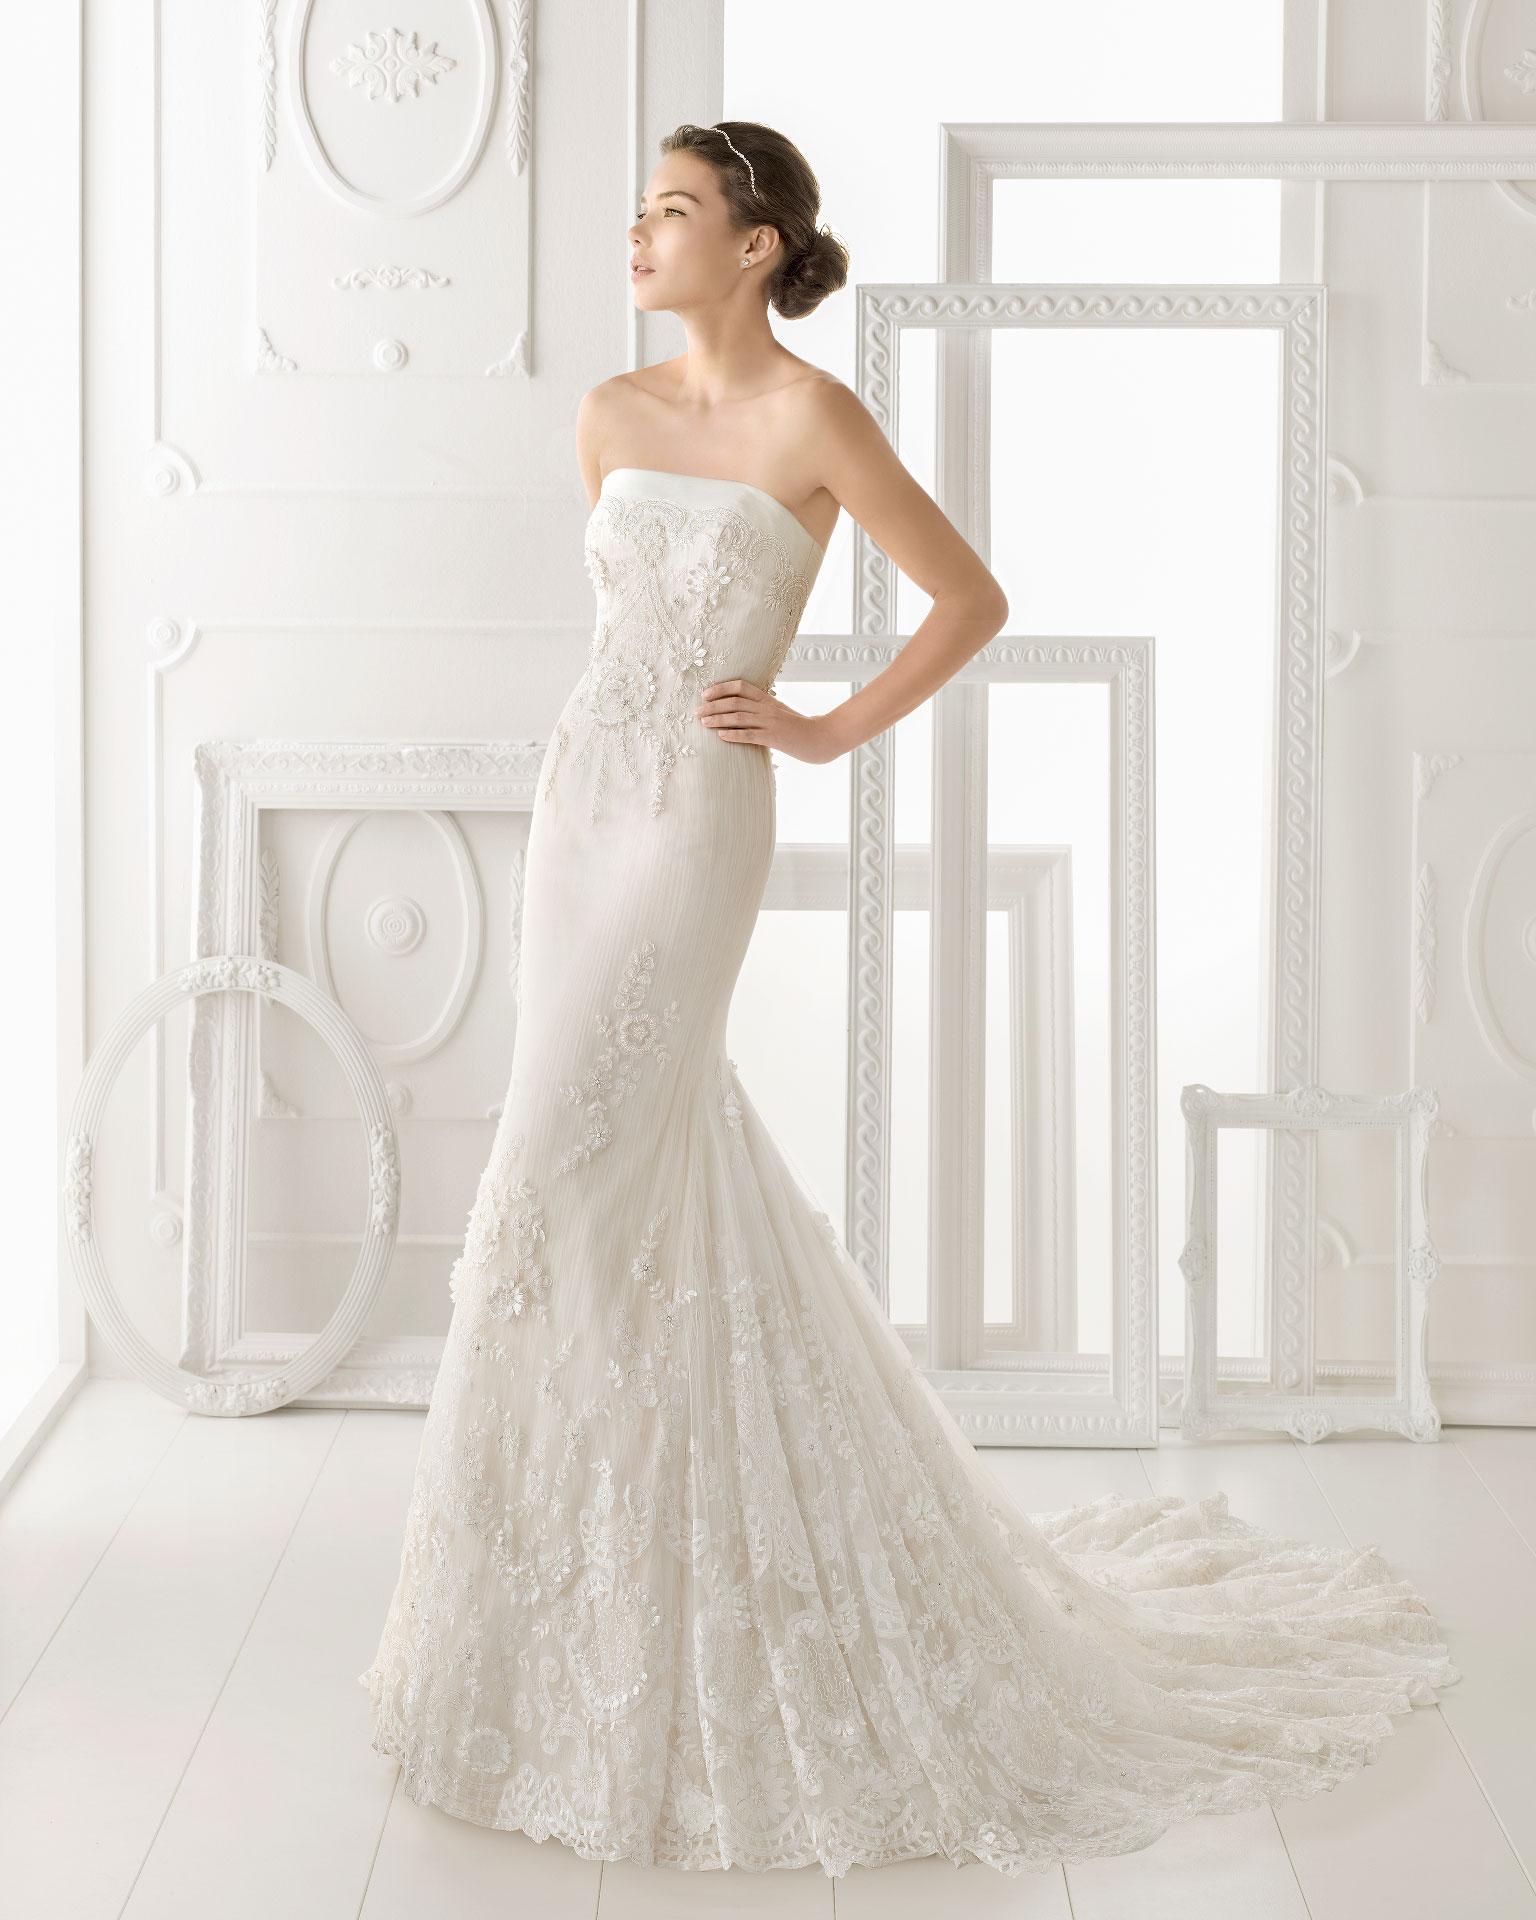 Simple Wedding Dress Hong Kong: Aire Barcelona Wedding Dress 2014 Bridal Osnel